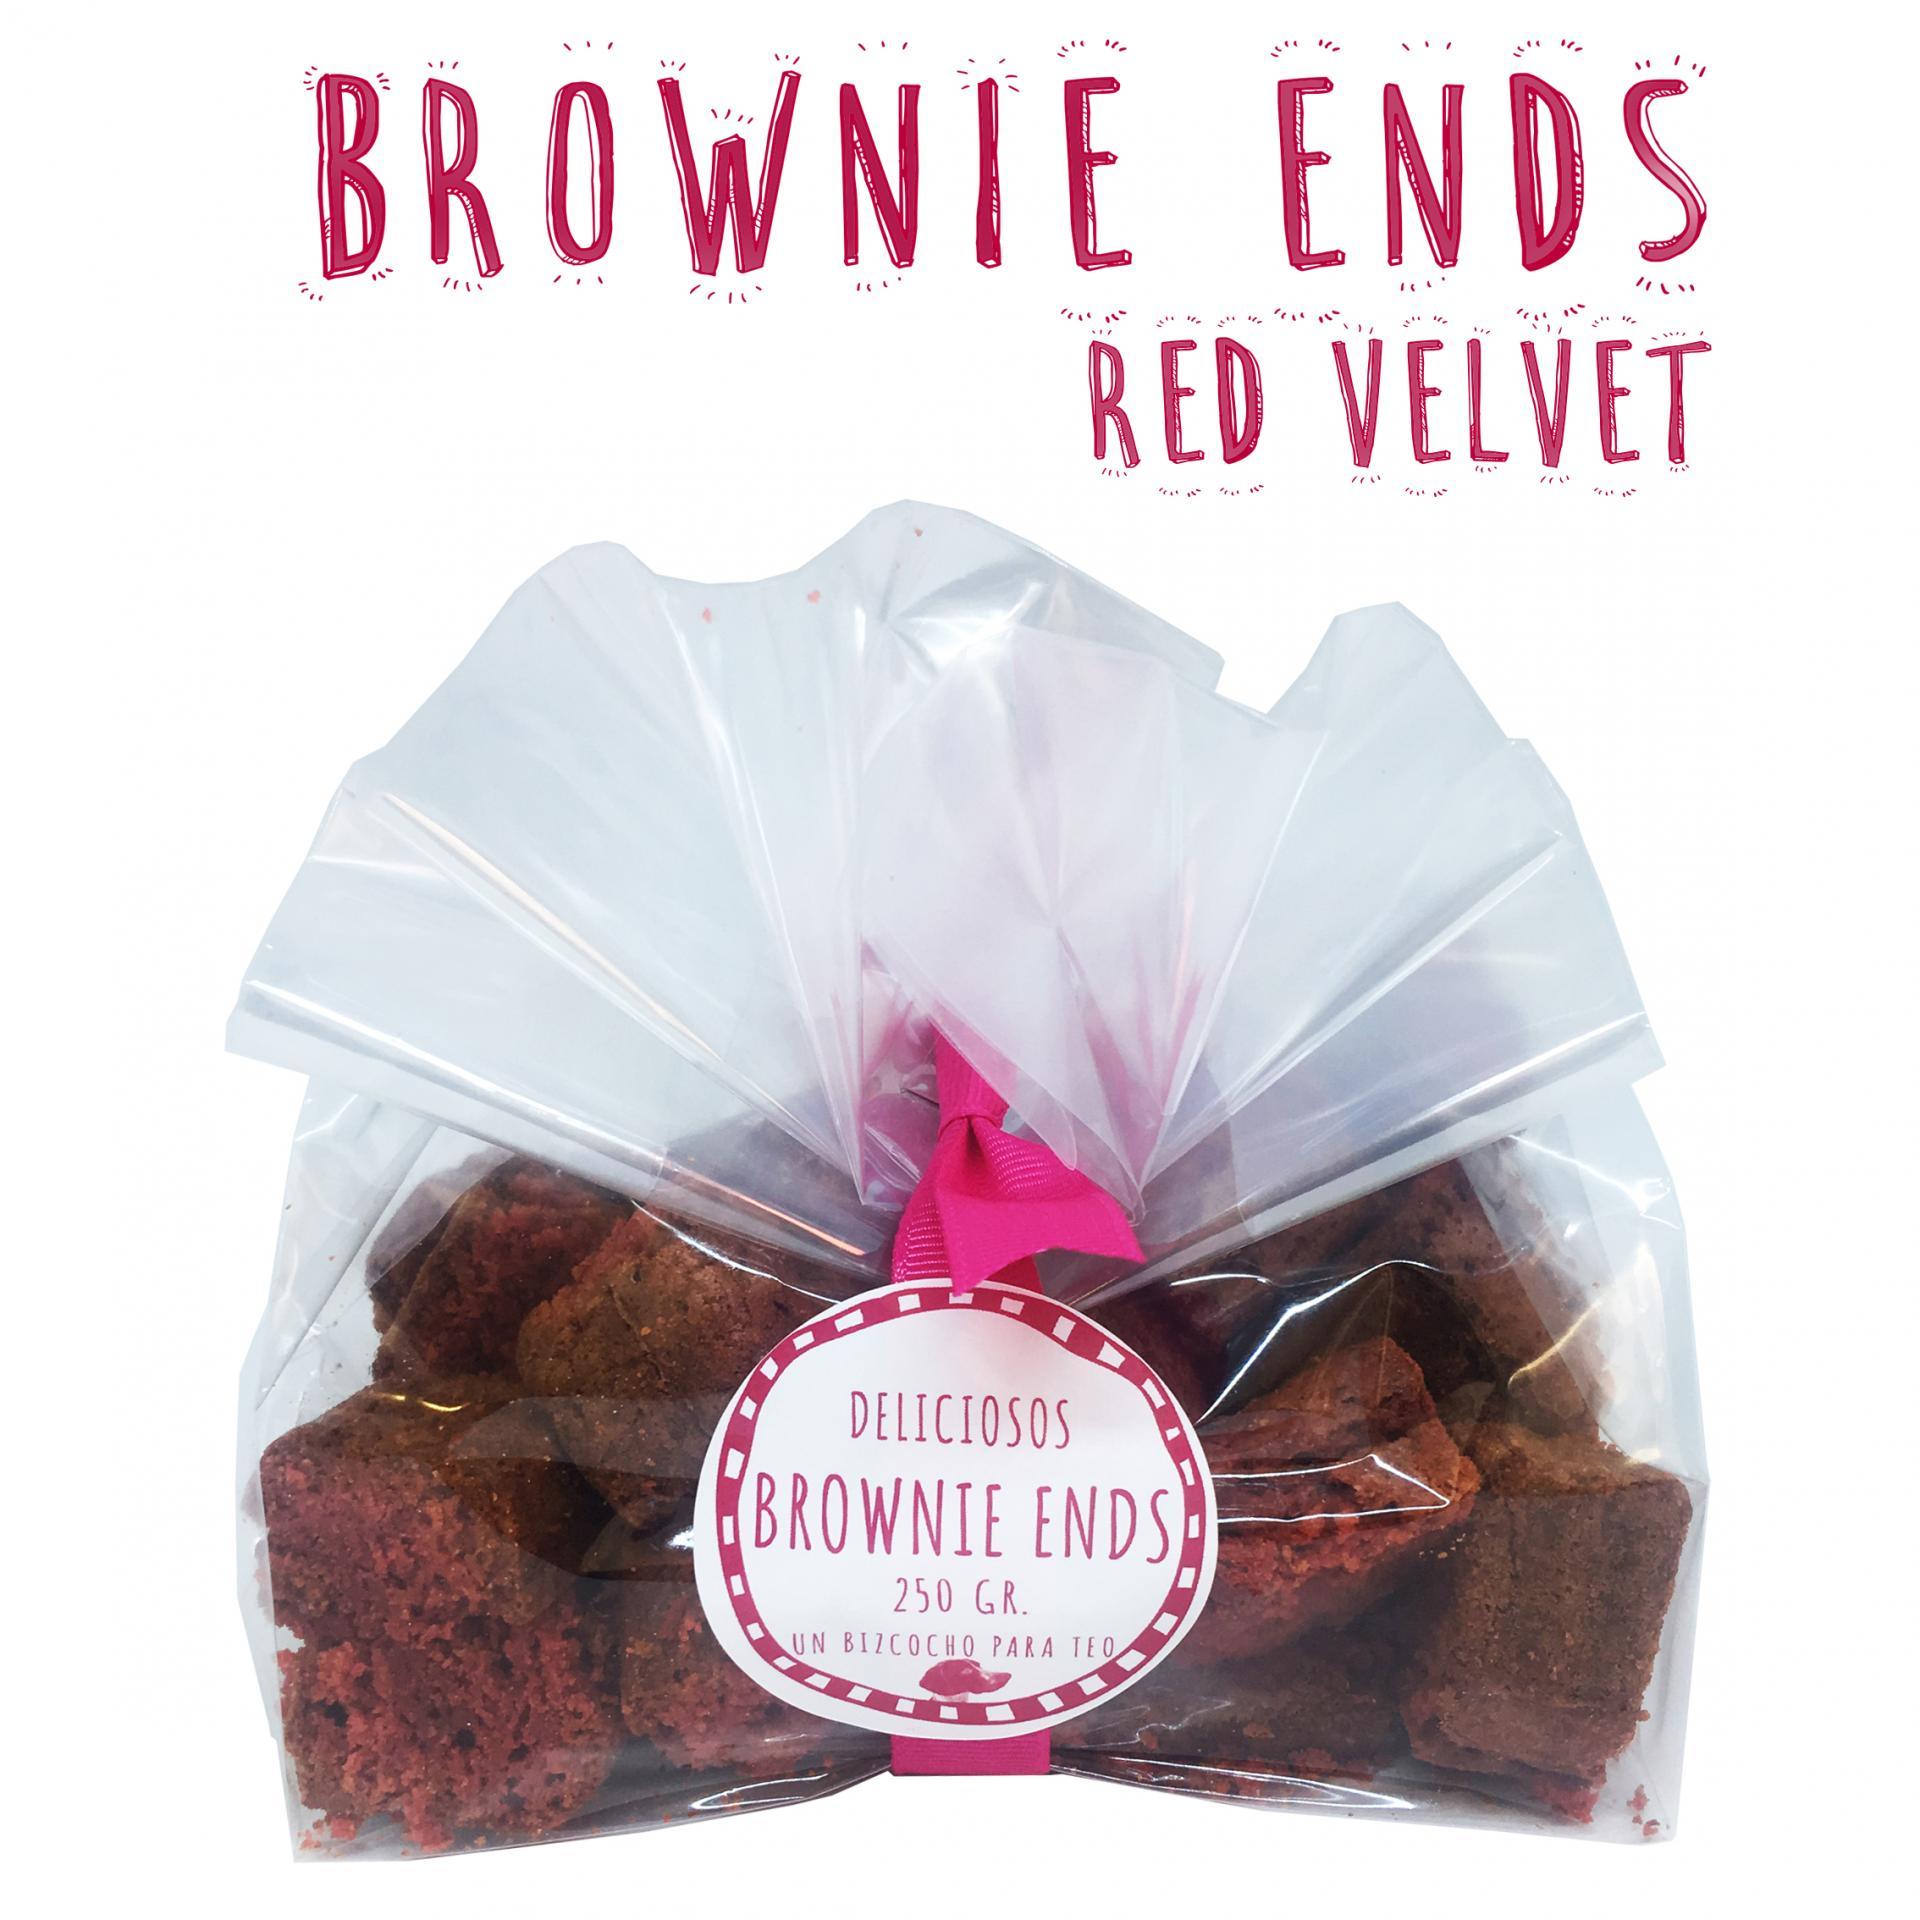 Brownie Ends Red Velvet